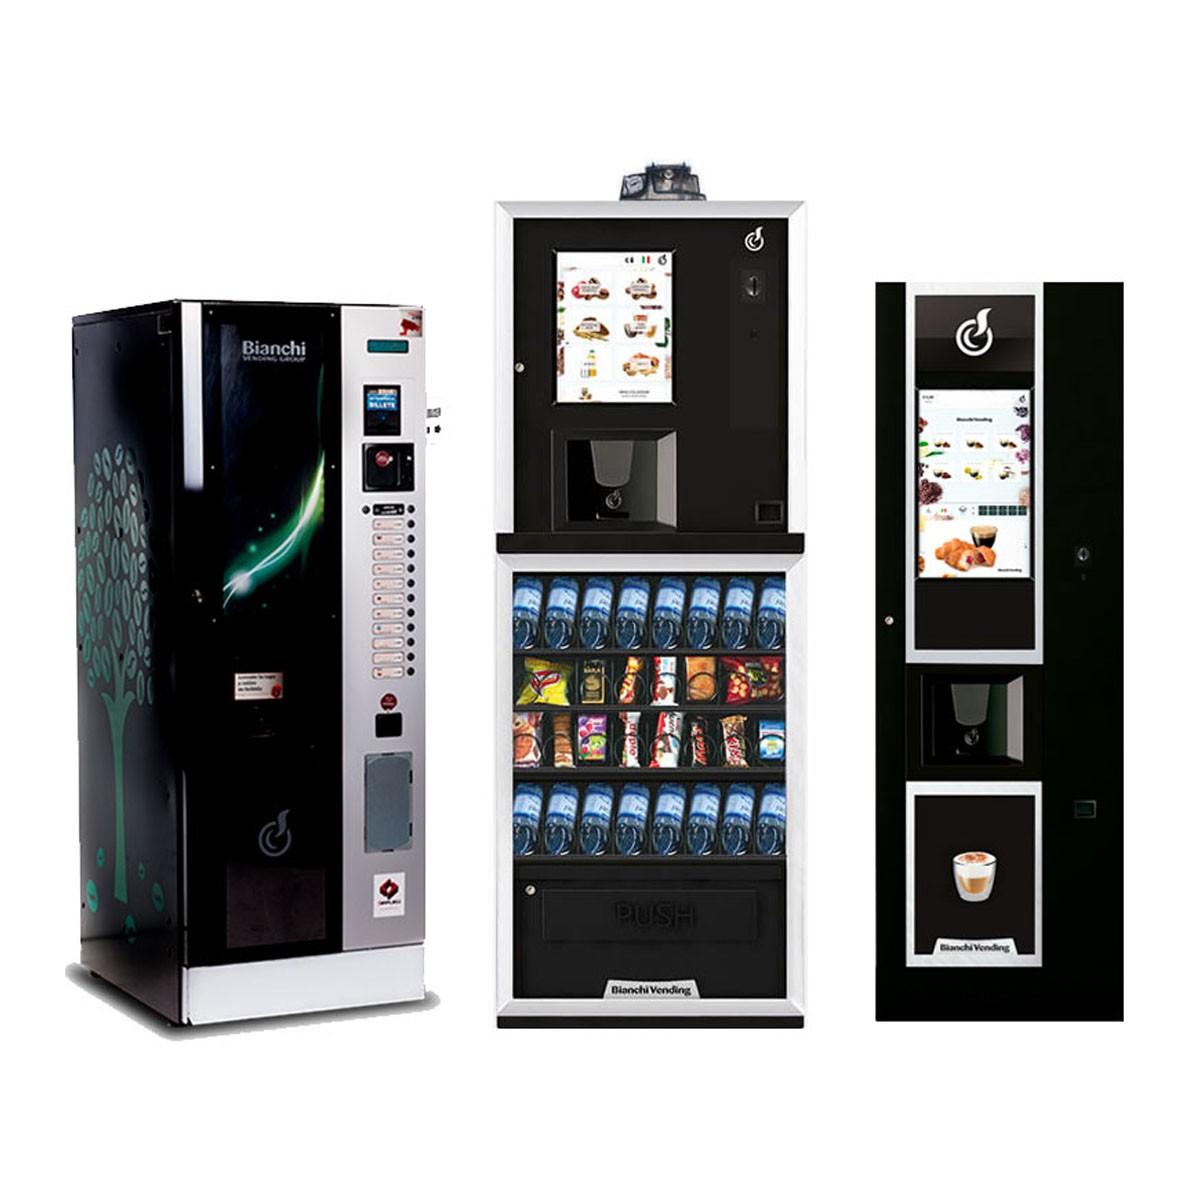 Máquinas FC Machine Vending Machines Auto Serviço